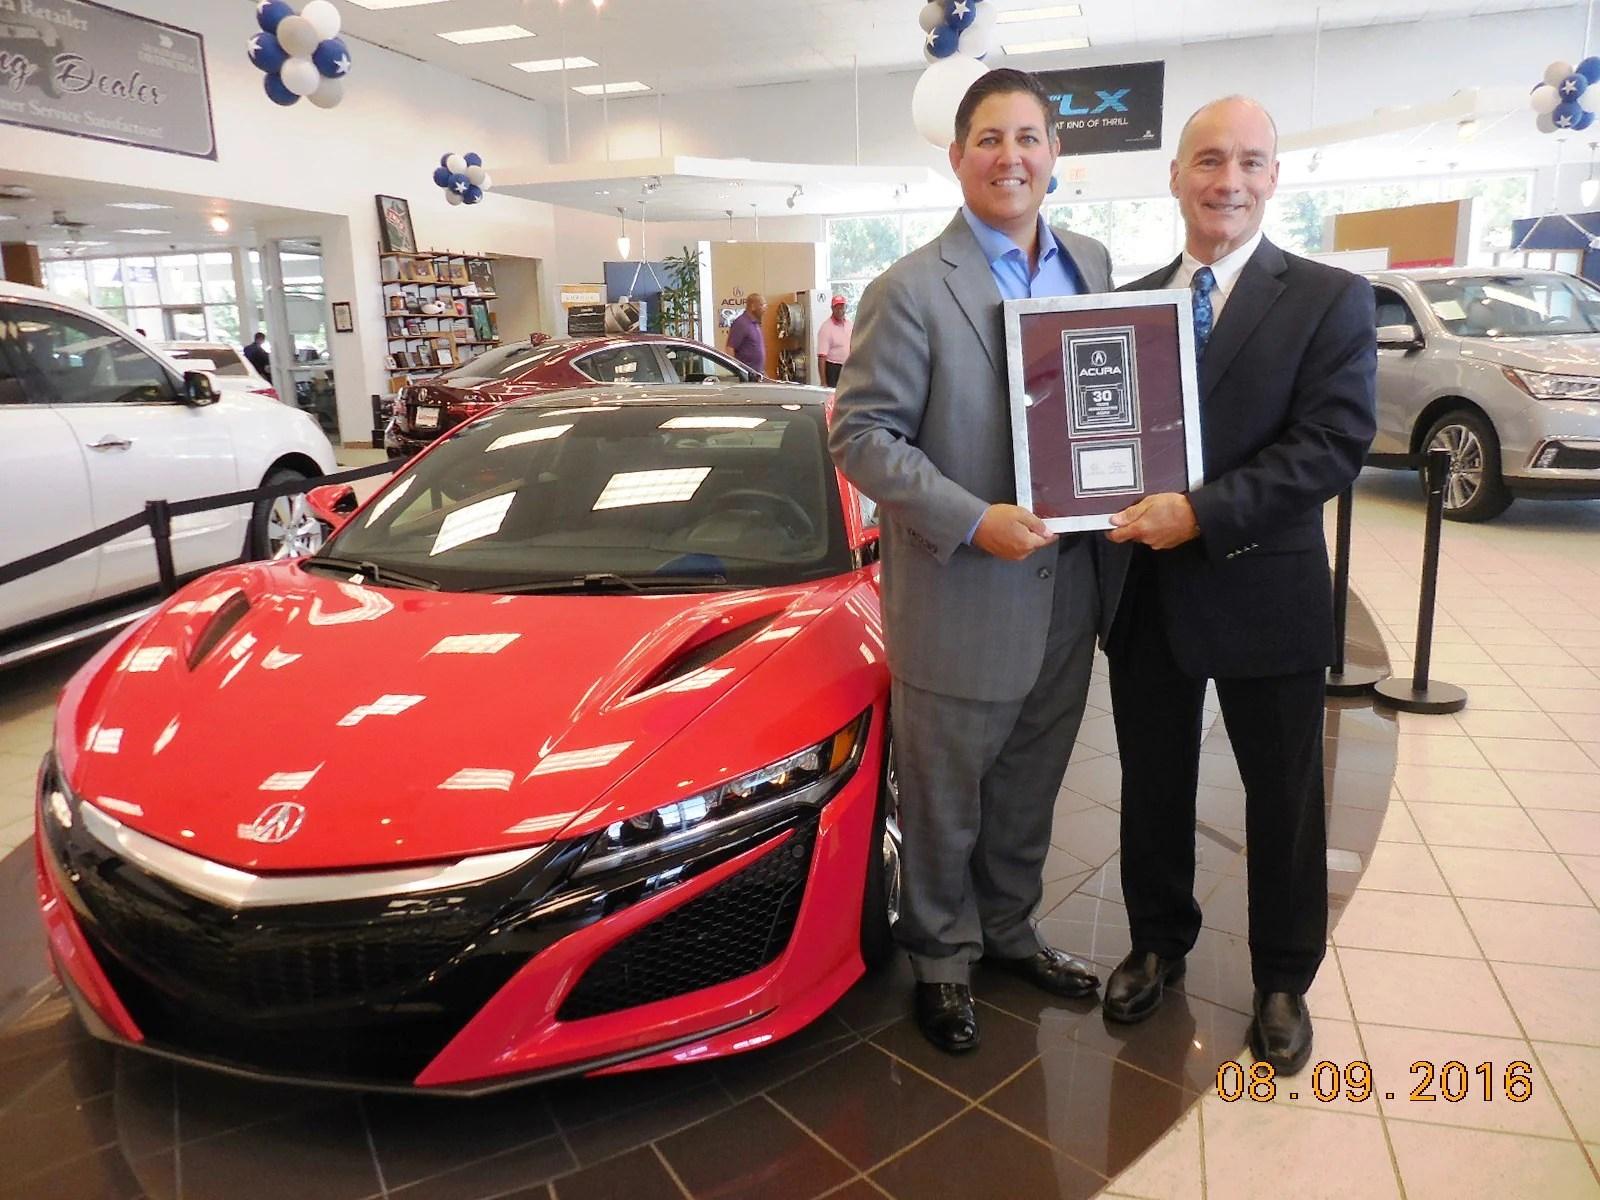 Fresh Acura Dealers In Houston Tx Honda Civic And Accord Gallery - Acura dealer houston texas